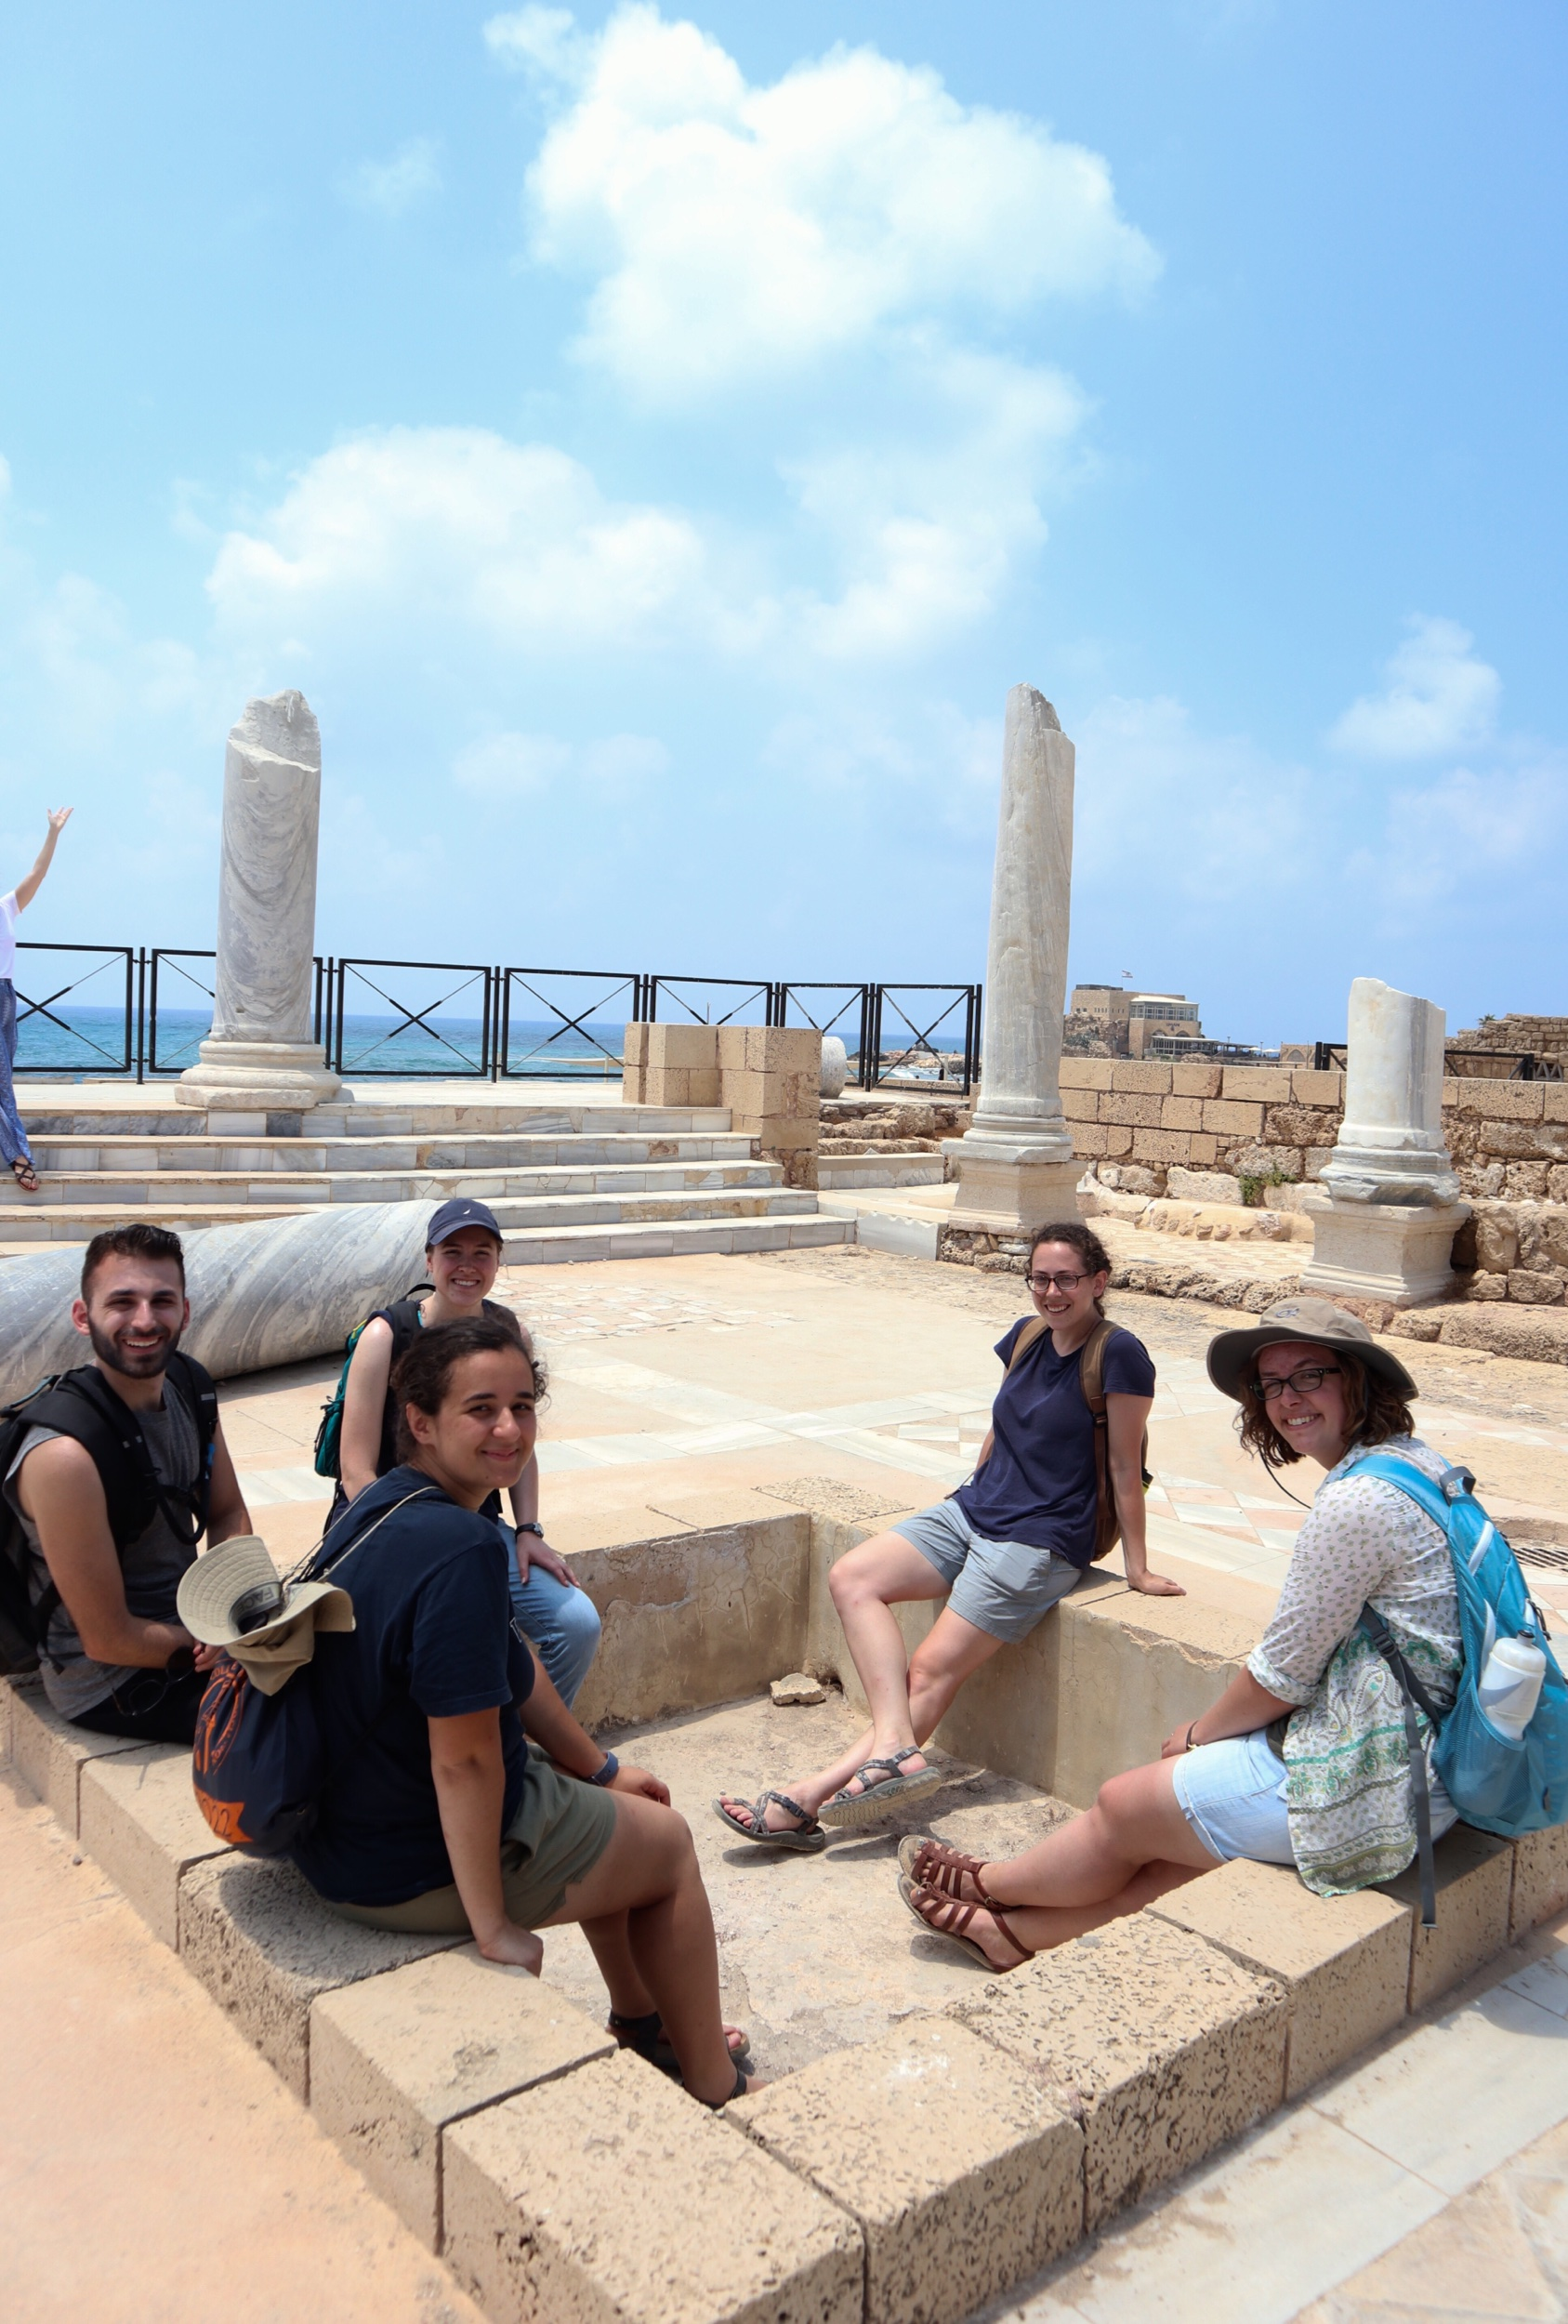 The team takes a break at Caesarea